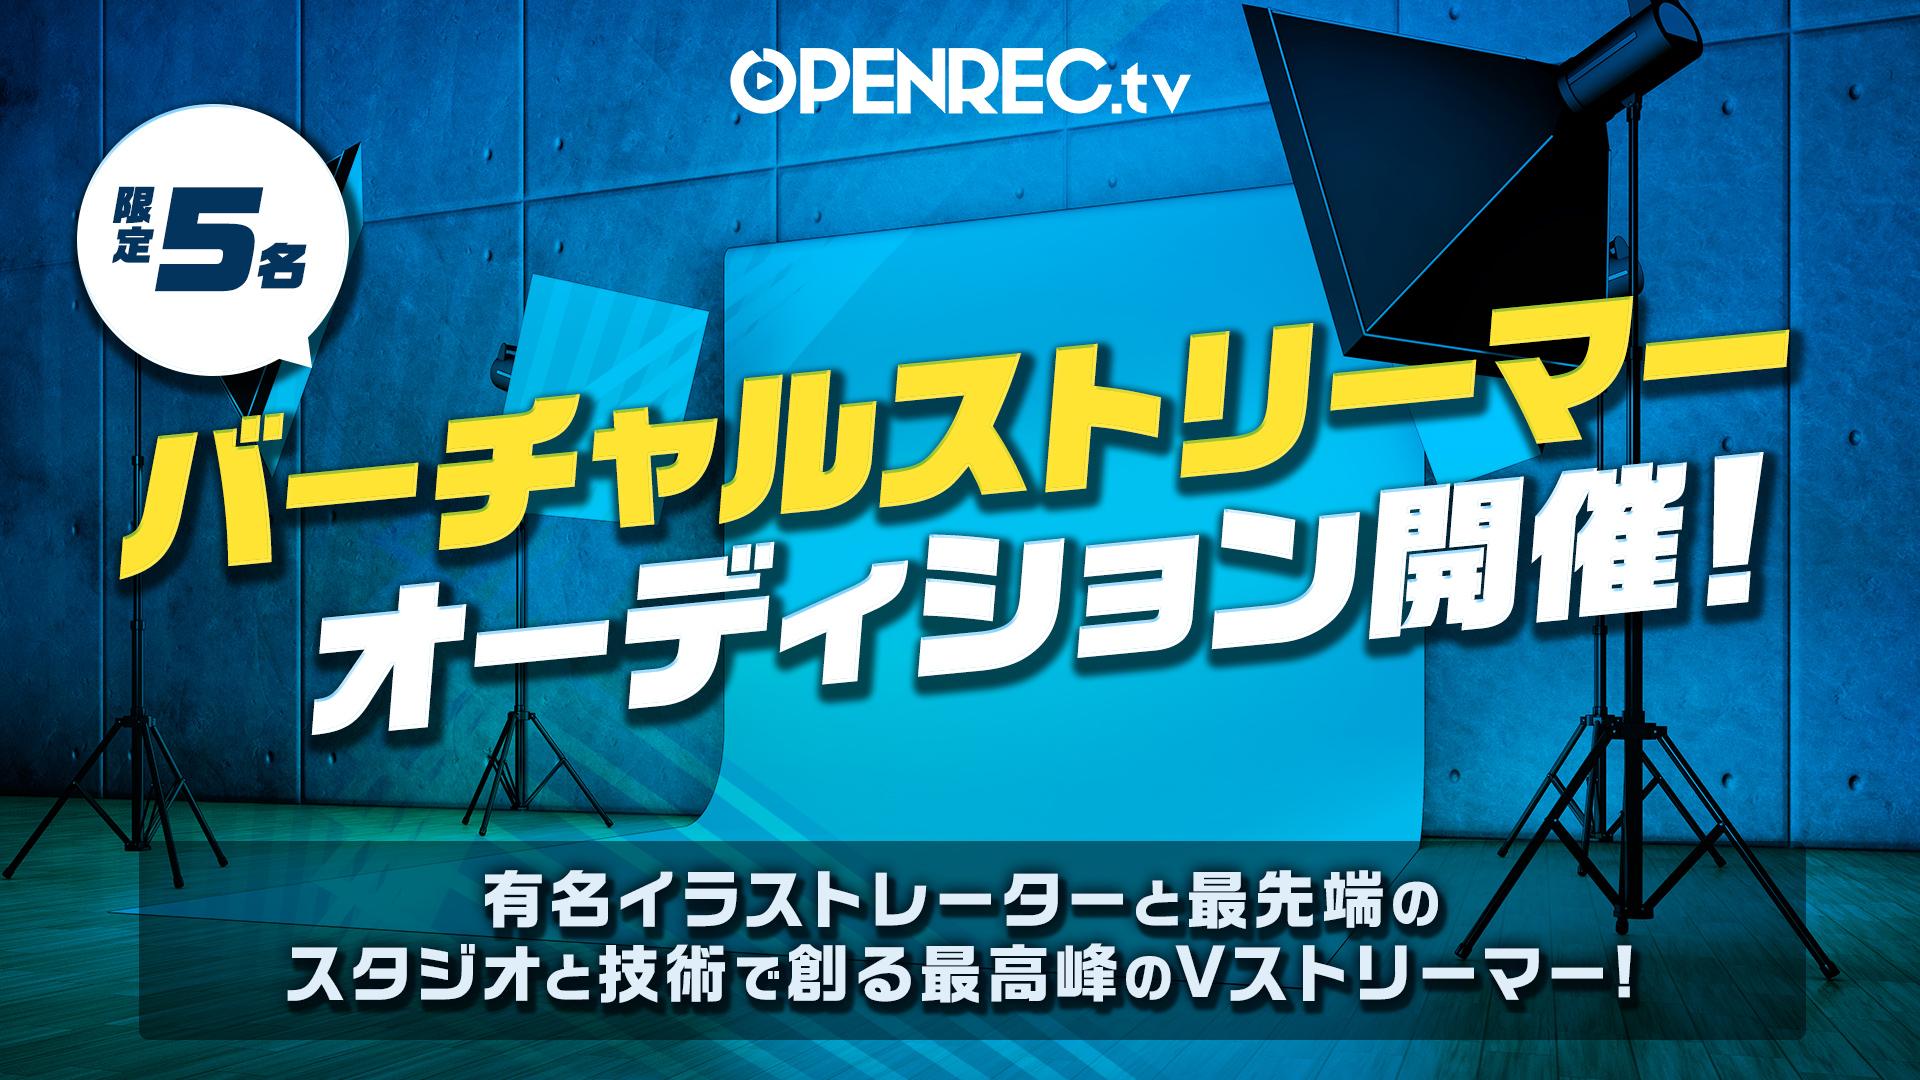 OPENREC.tv presents バーチャルストリーマーオーディション開催!